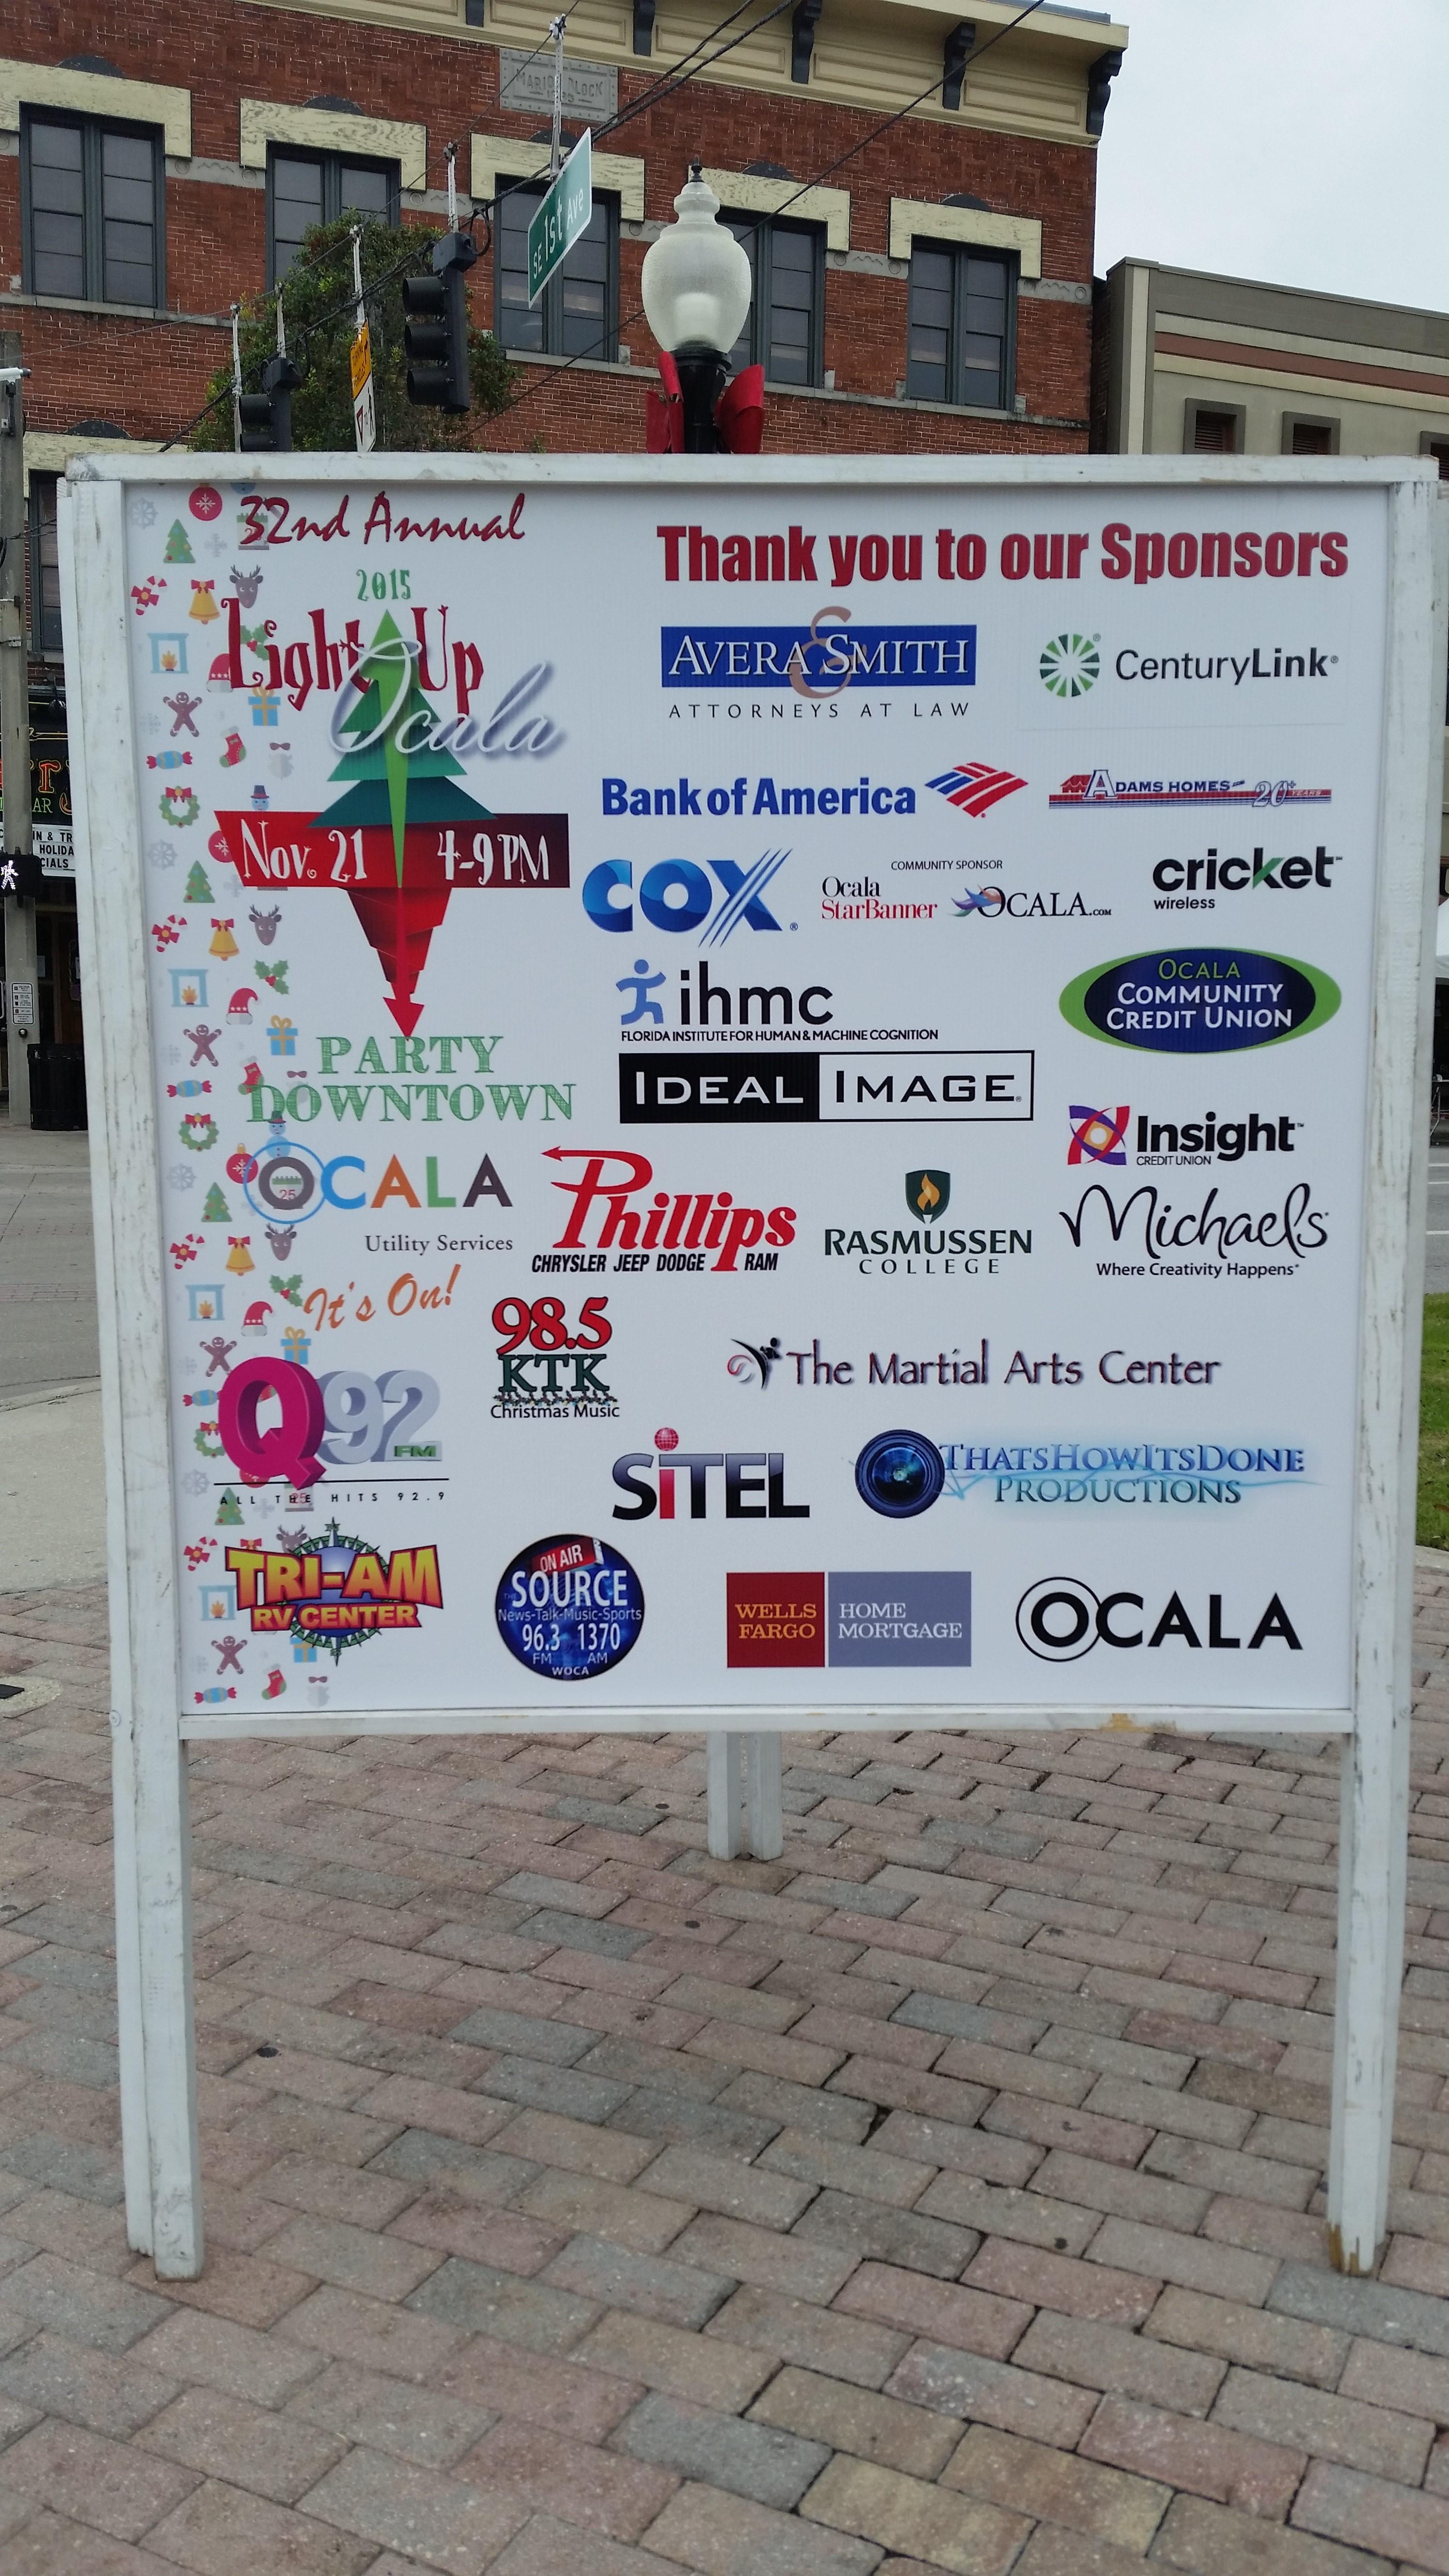 11-21-2015 Light Up Ocala Sponsors